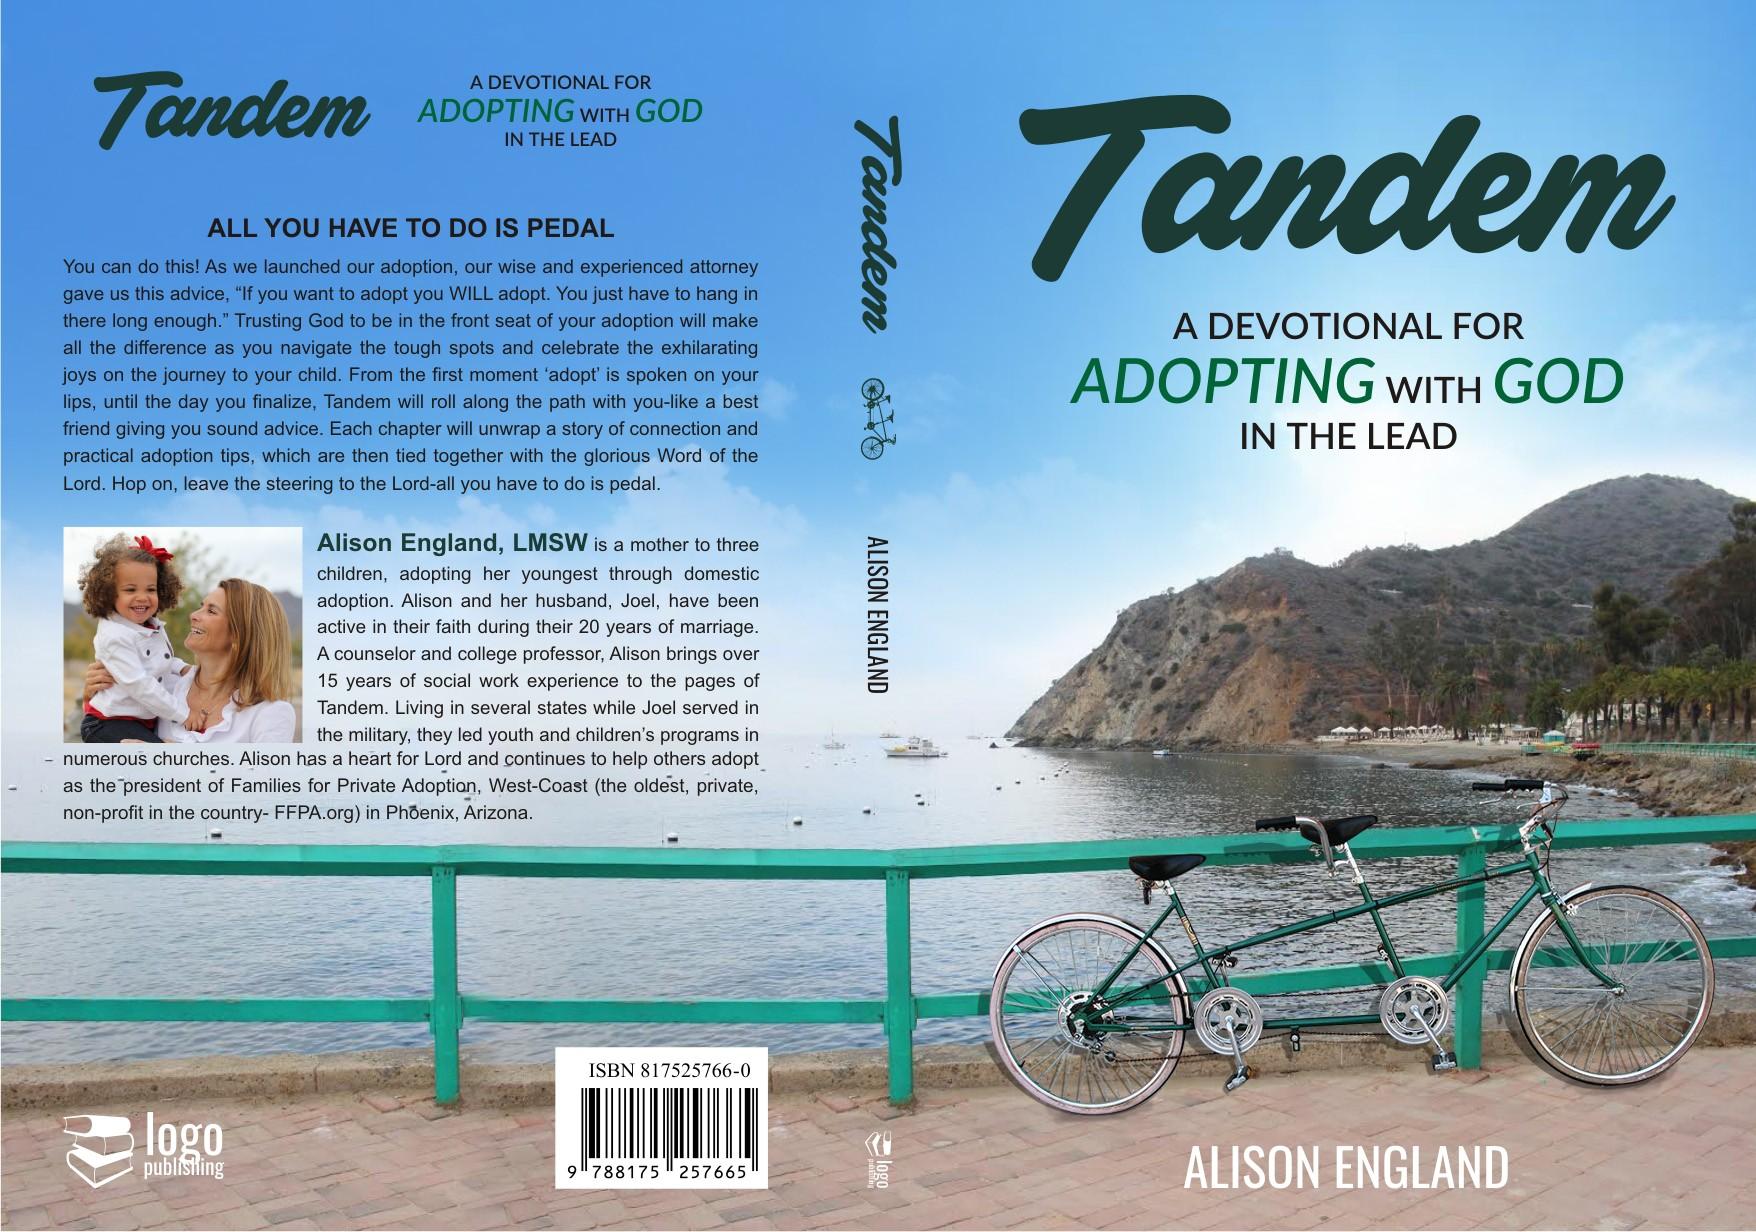 Old-School beach Cruiser, Tandem bike for hopeful adoption story-book cover